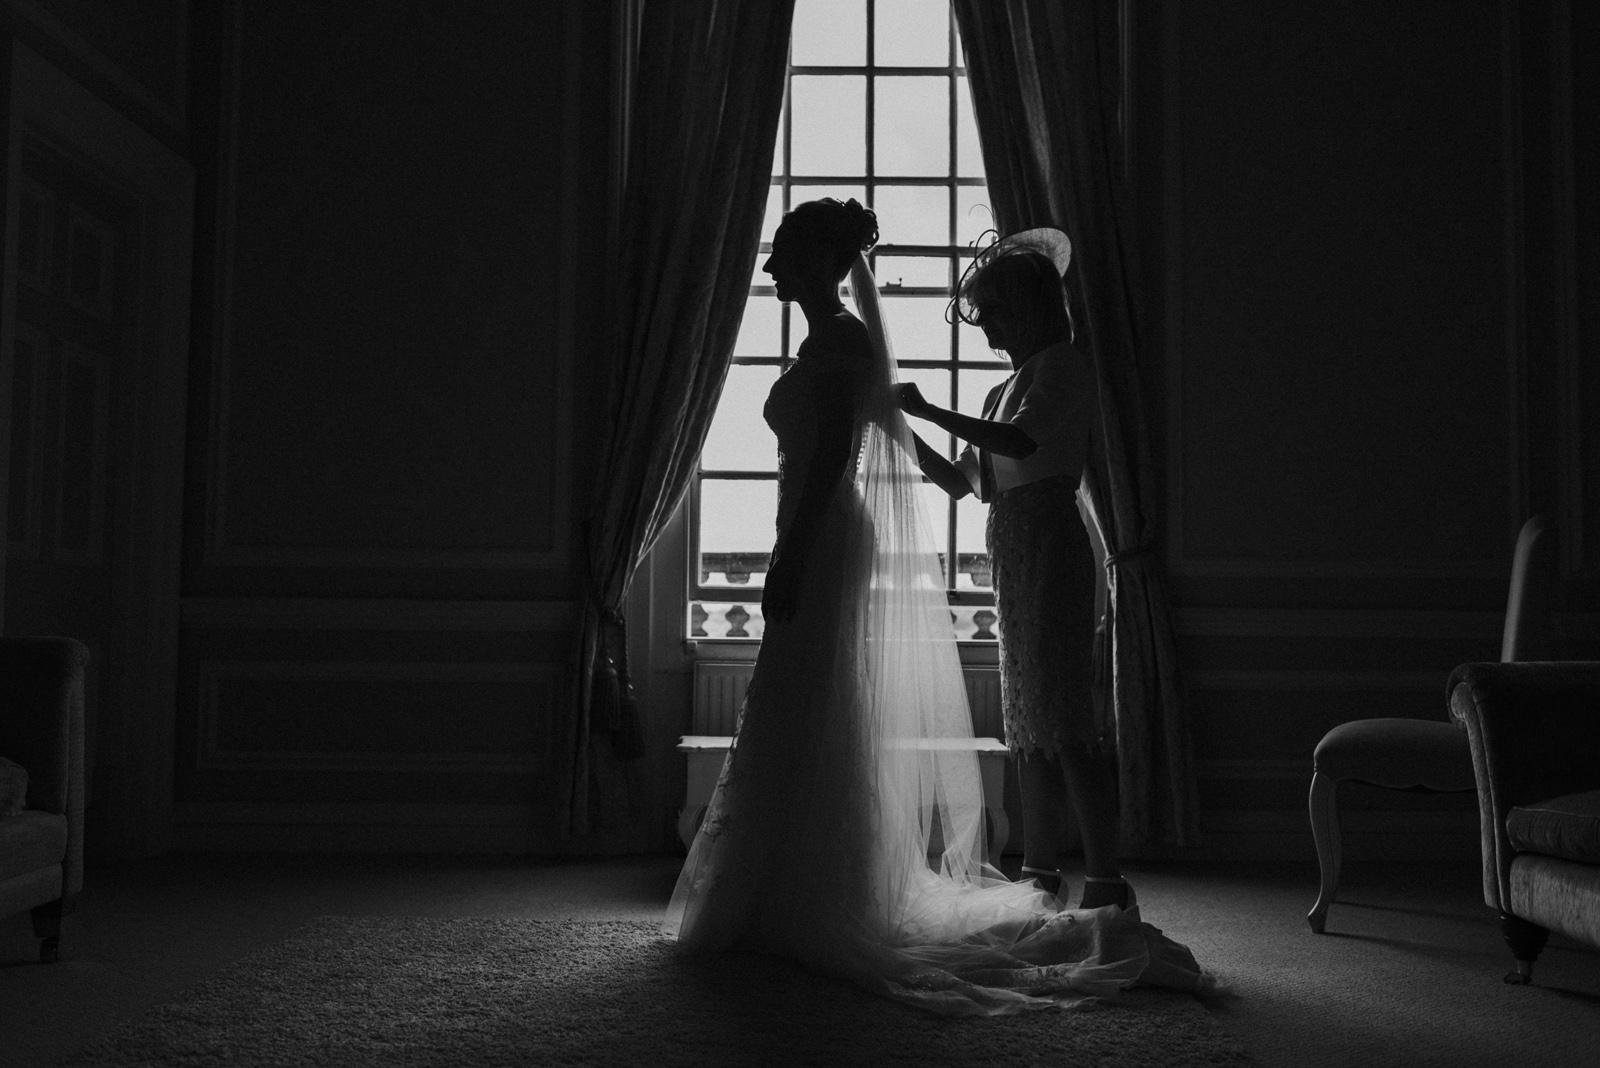 Mum helps bride into wedding dress